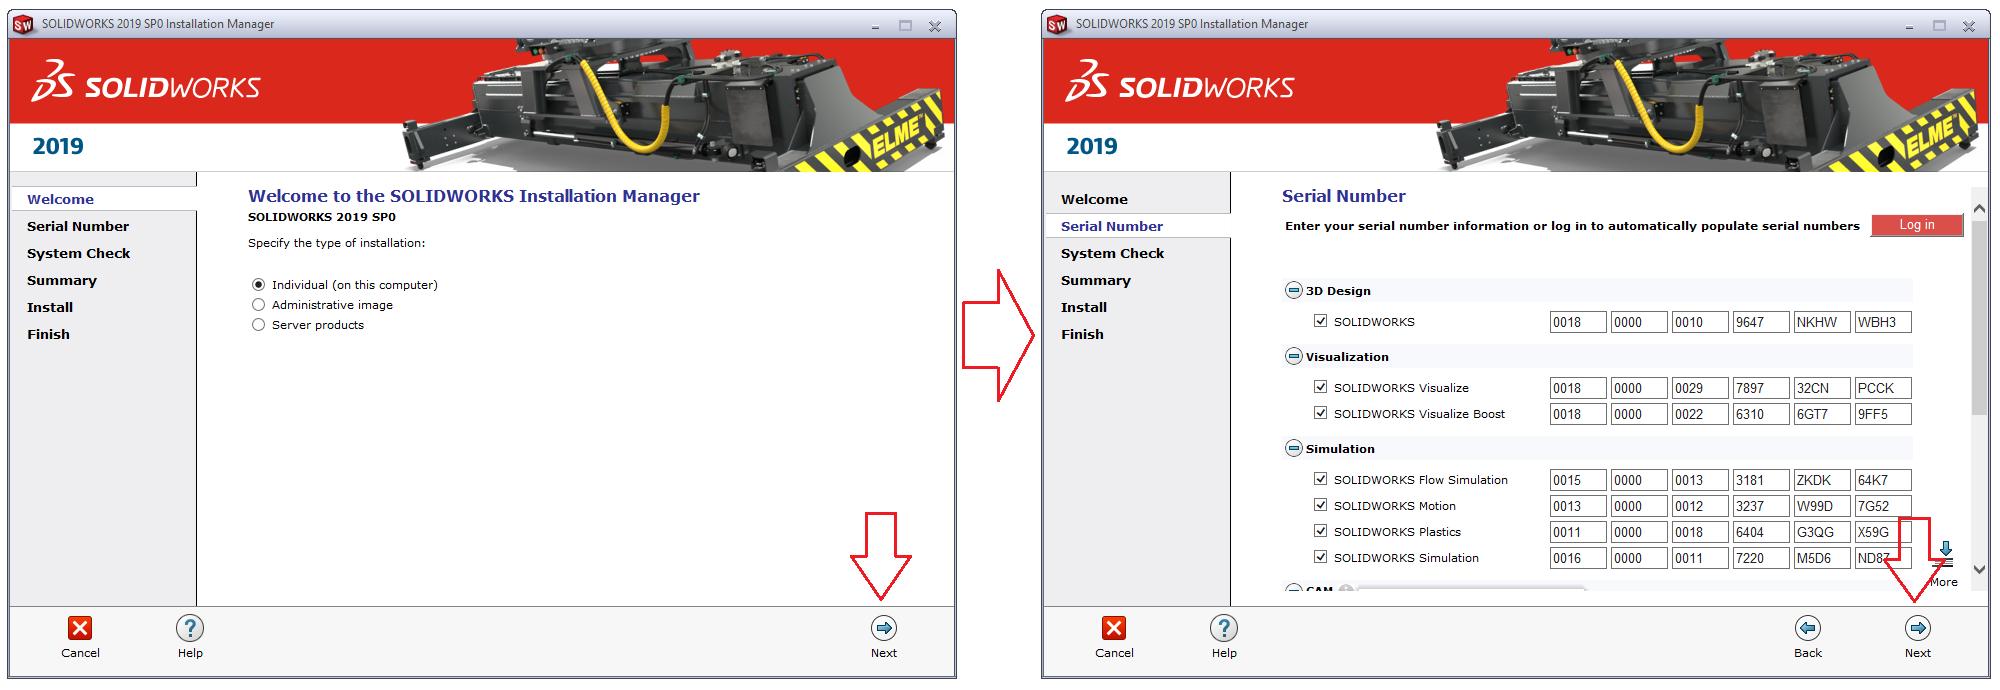 Download SolidWorks 2019 Full Crack Link Google Drive + Hướng Dẫn Cài Đặt Chi Tiết